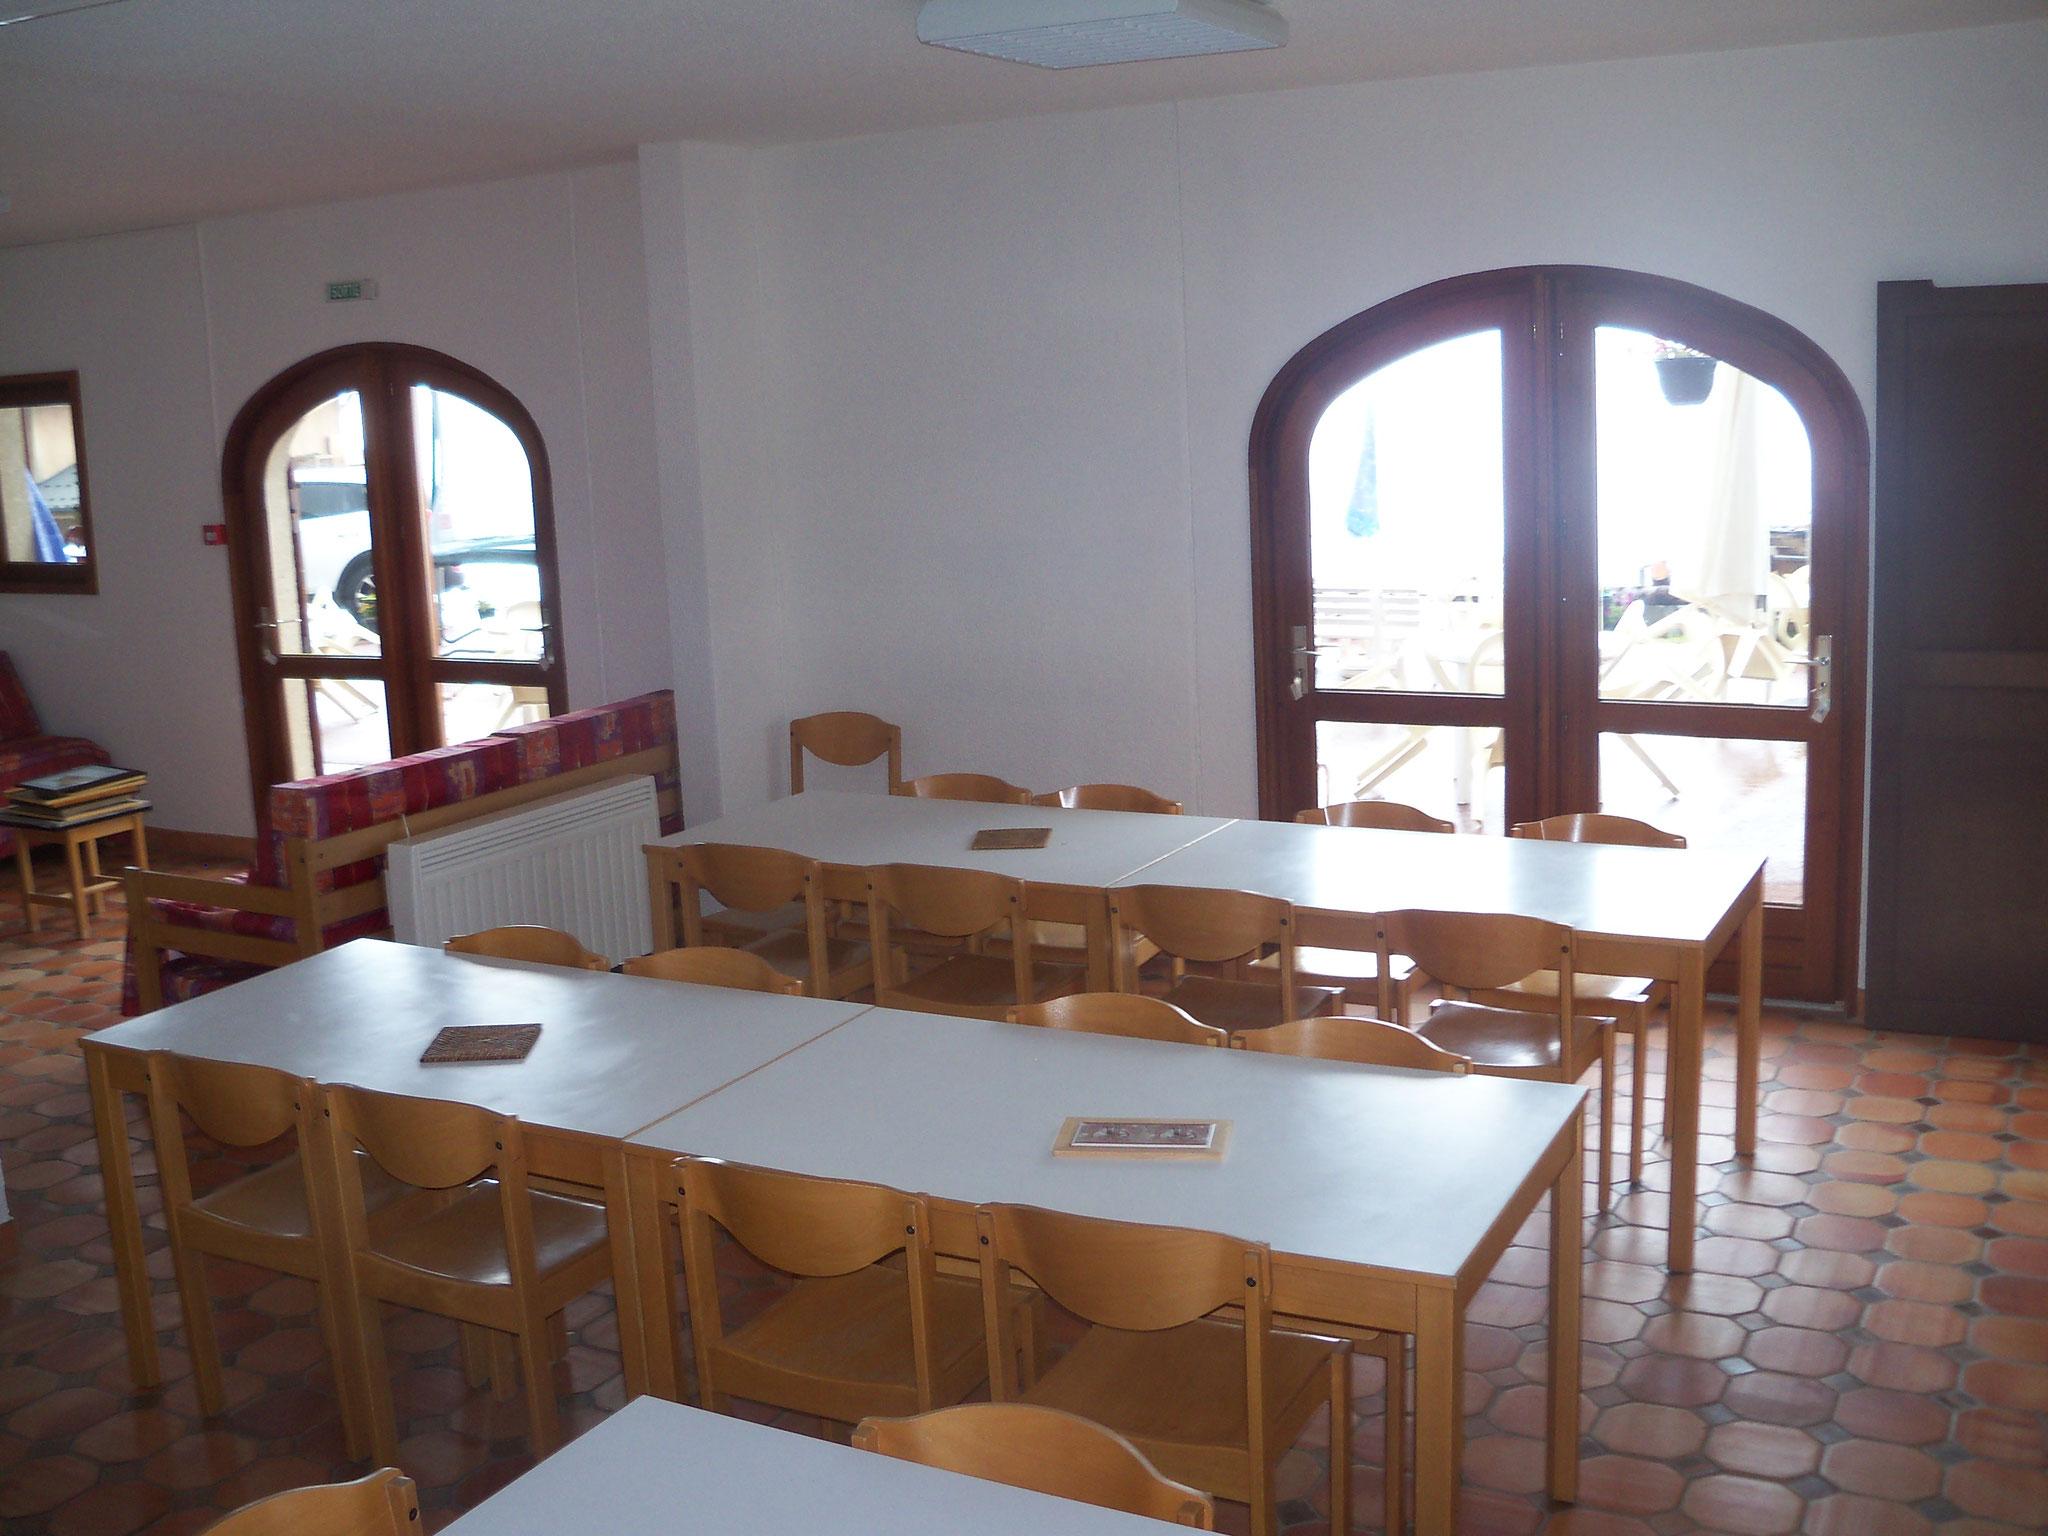 La salle commune